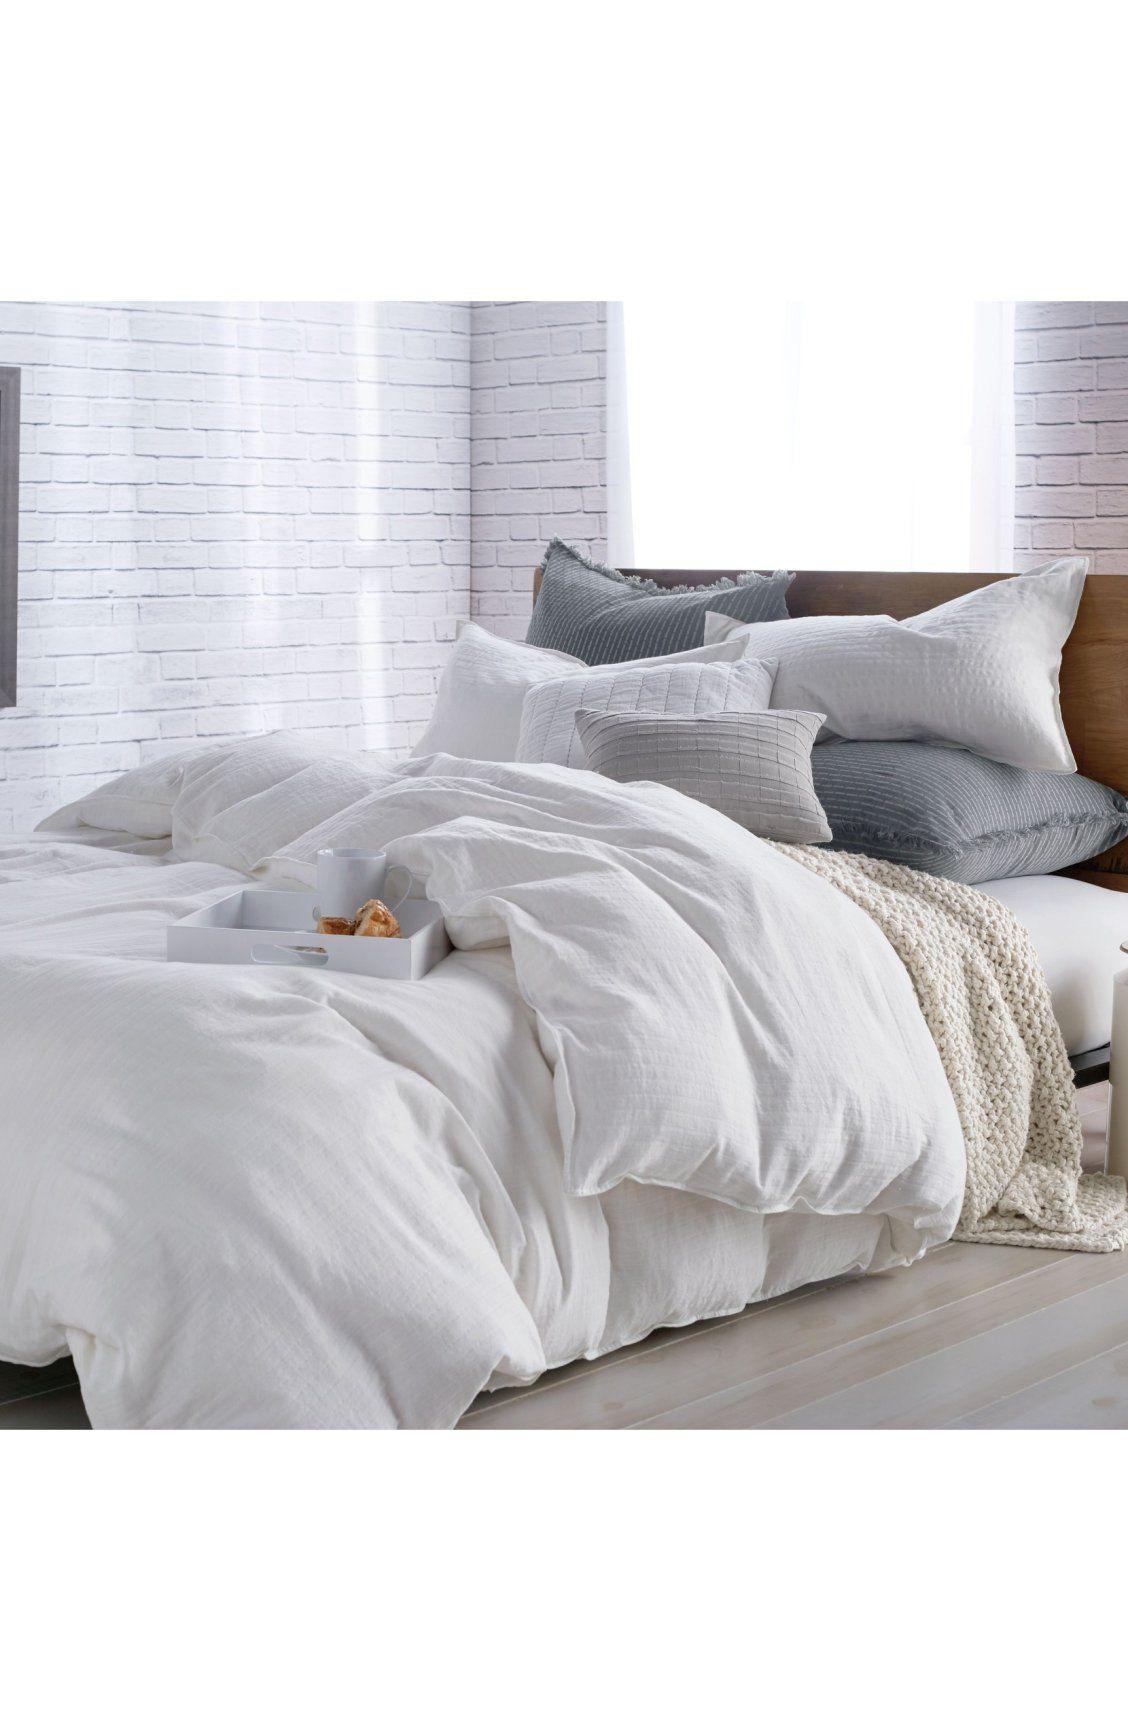 Subtle Stripes Make Their Mark On A Lightweight Cotton Duvet